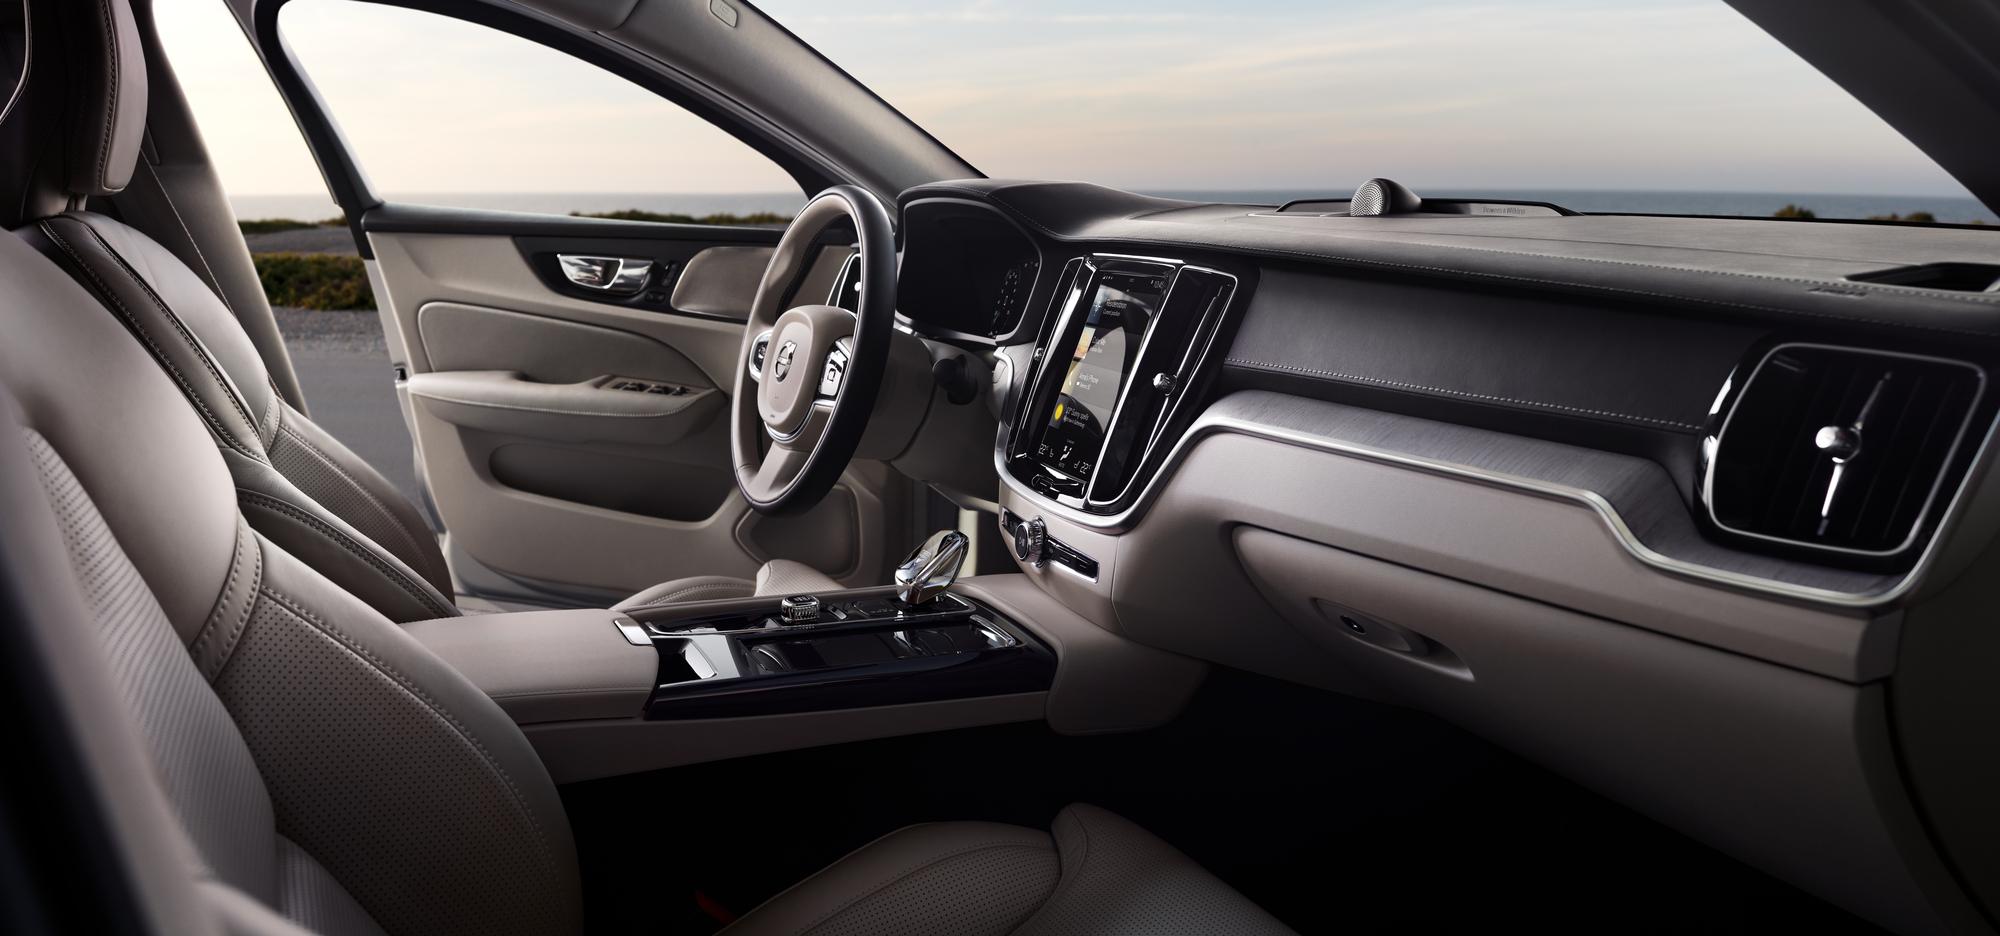 Volvo'nun B5 AWD 2.0 benzinli iç kokpit